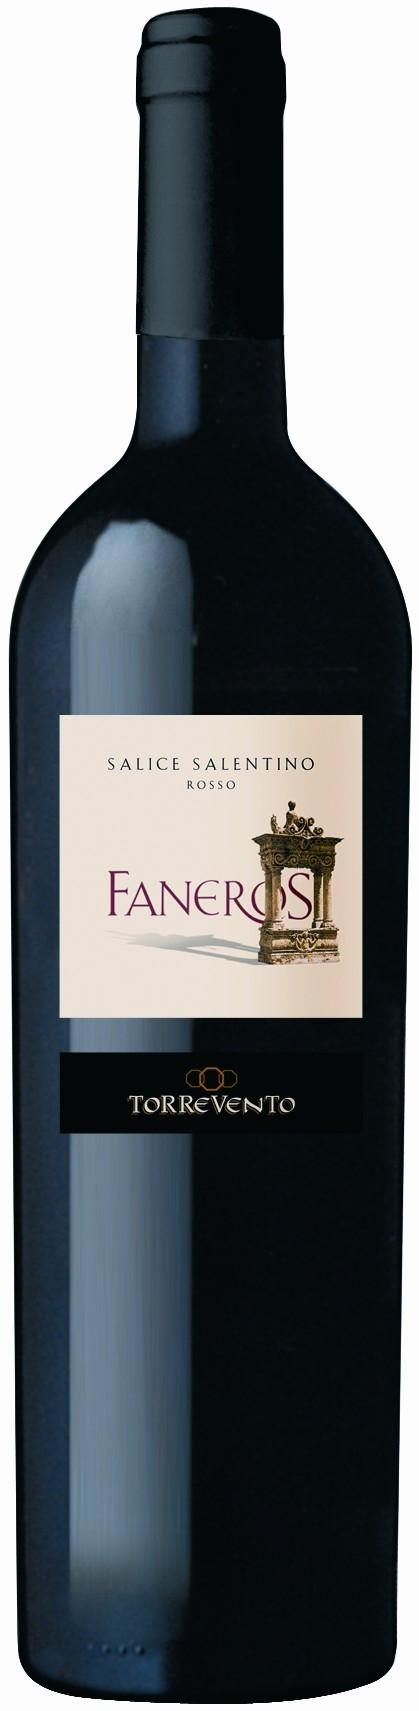 Torrevento Salice Salentino Faneros DOC